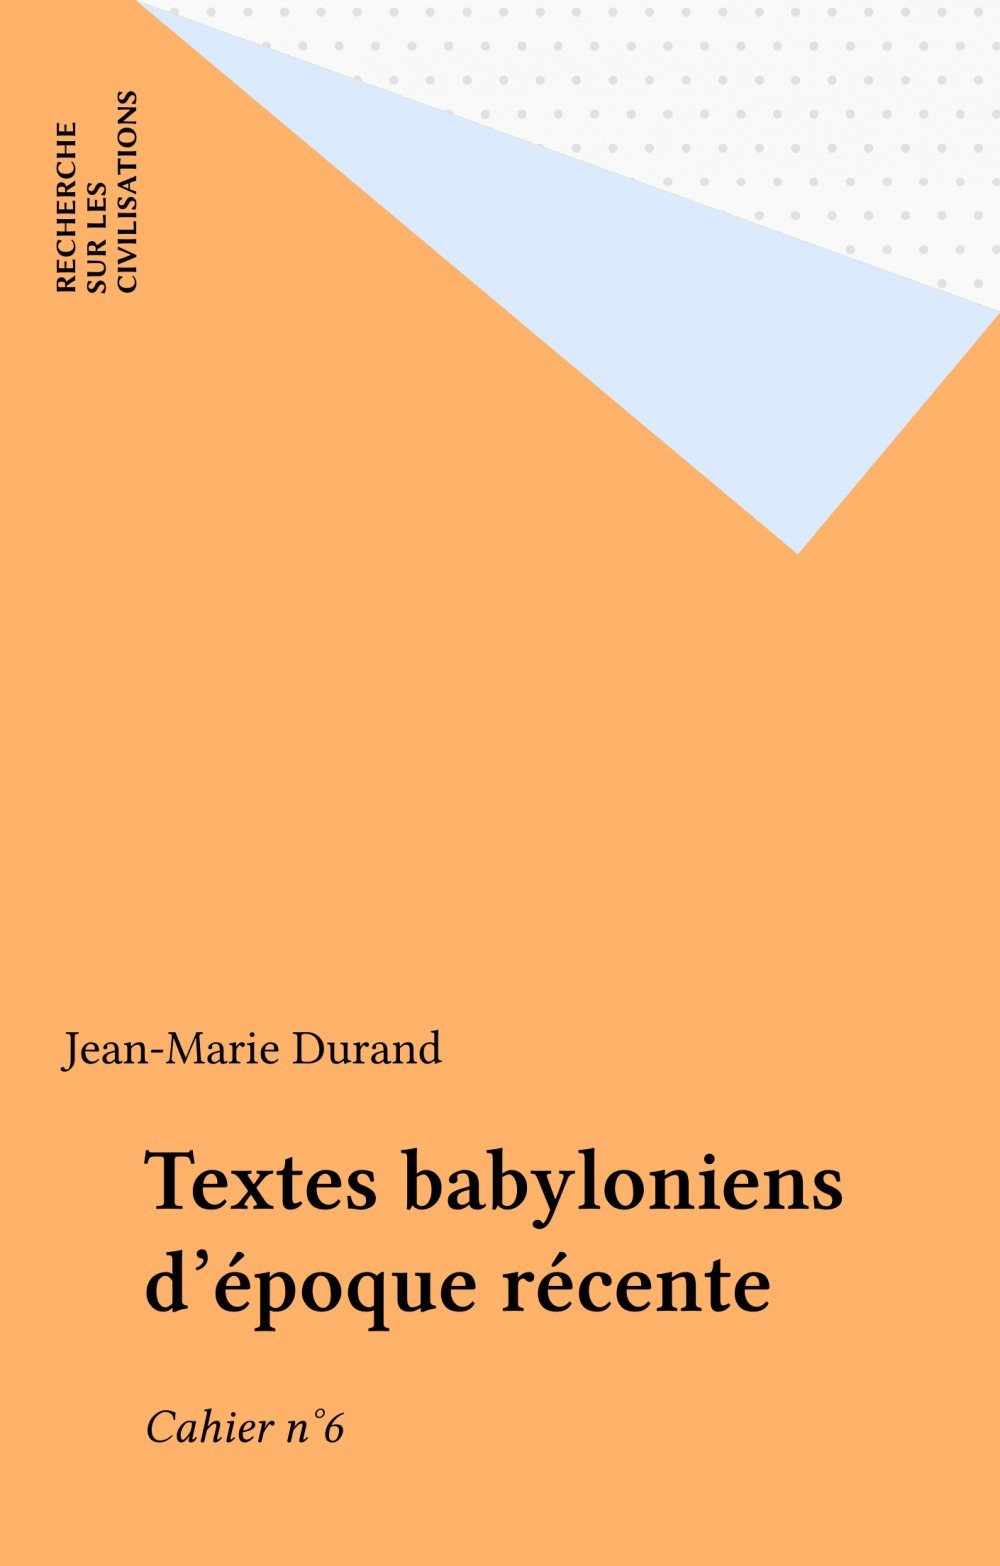 Textes babyloniens d'epoque recente